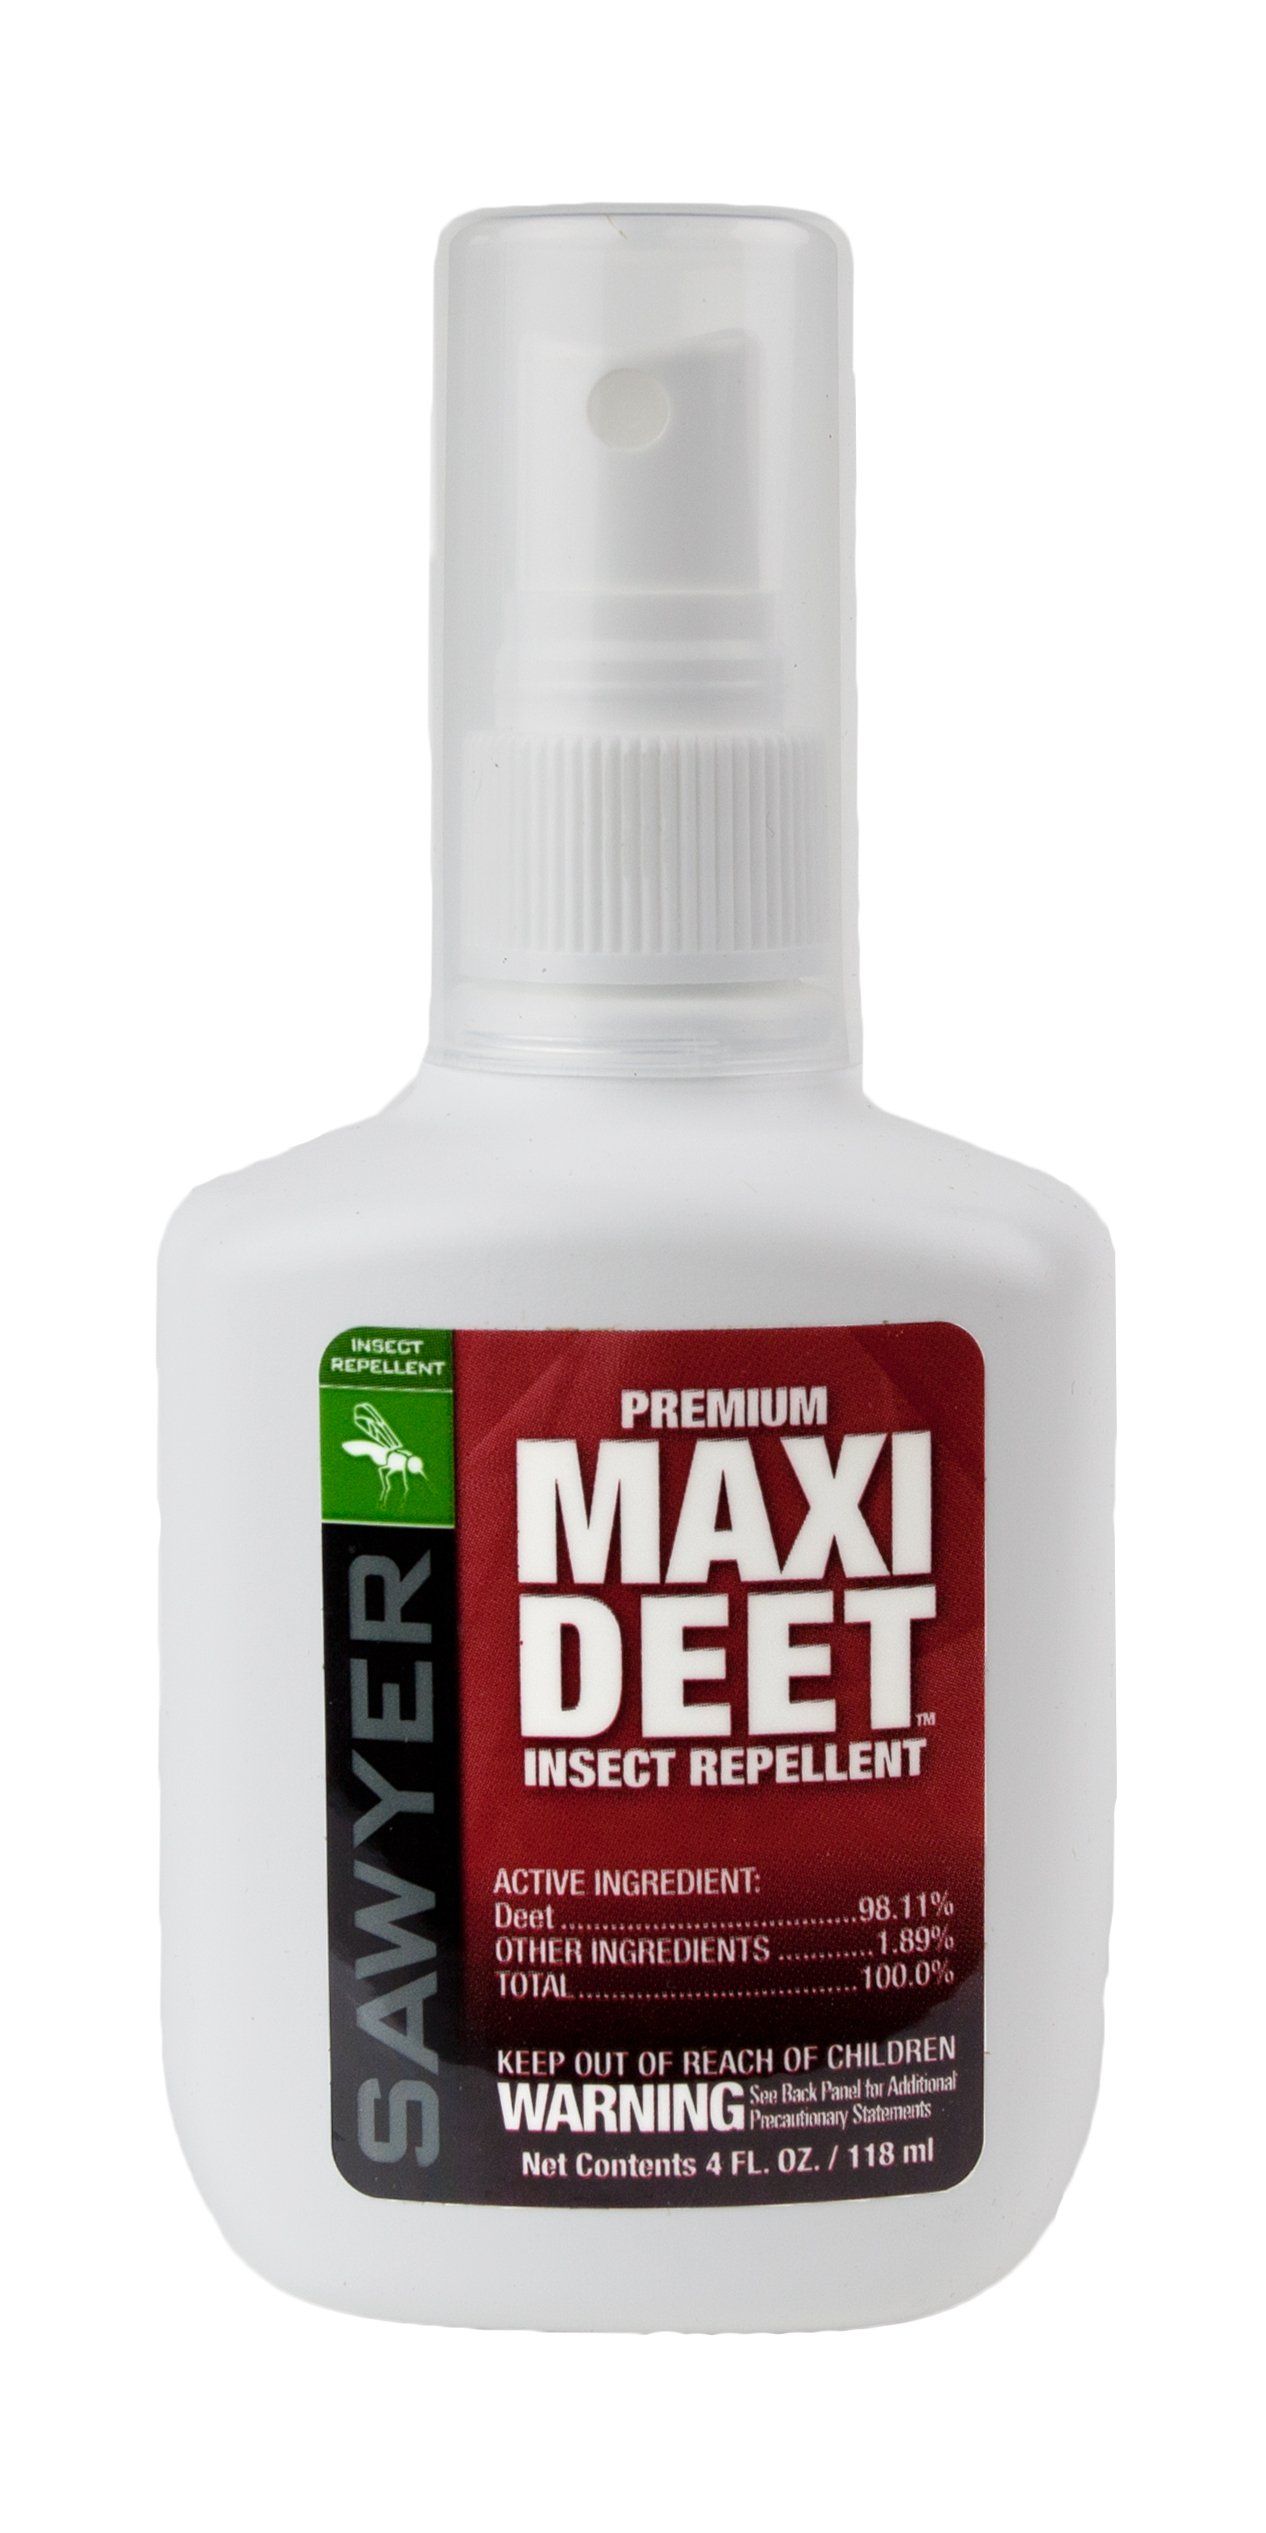 Sawyer Products Premium MAXI DEET, 100% DEET Insect Repellent